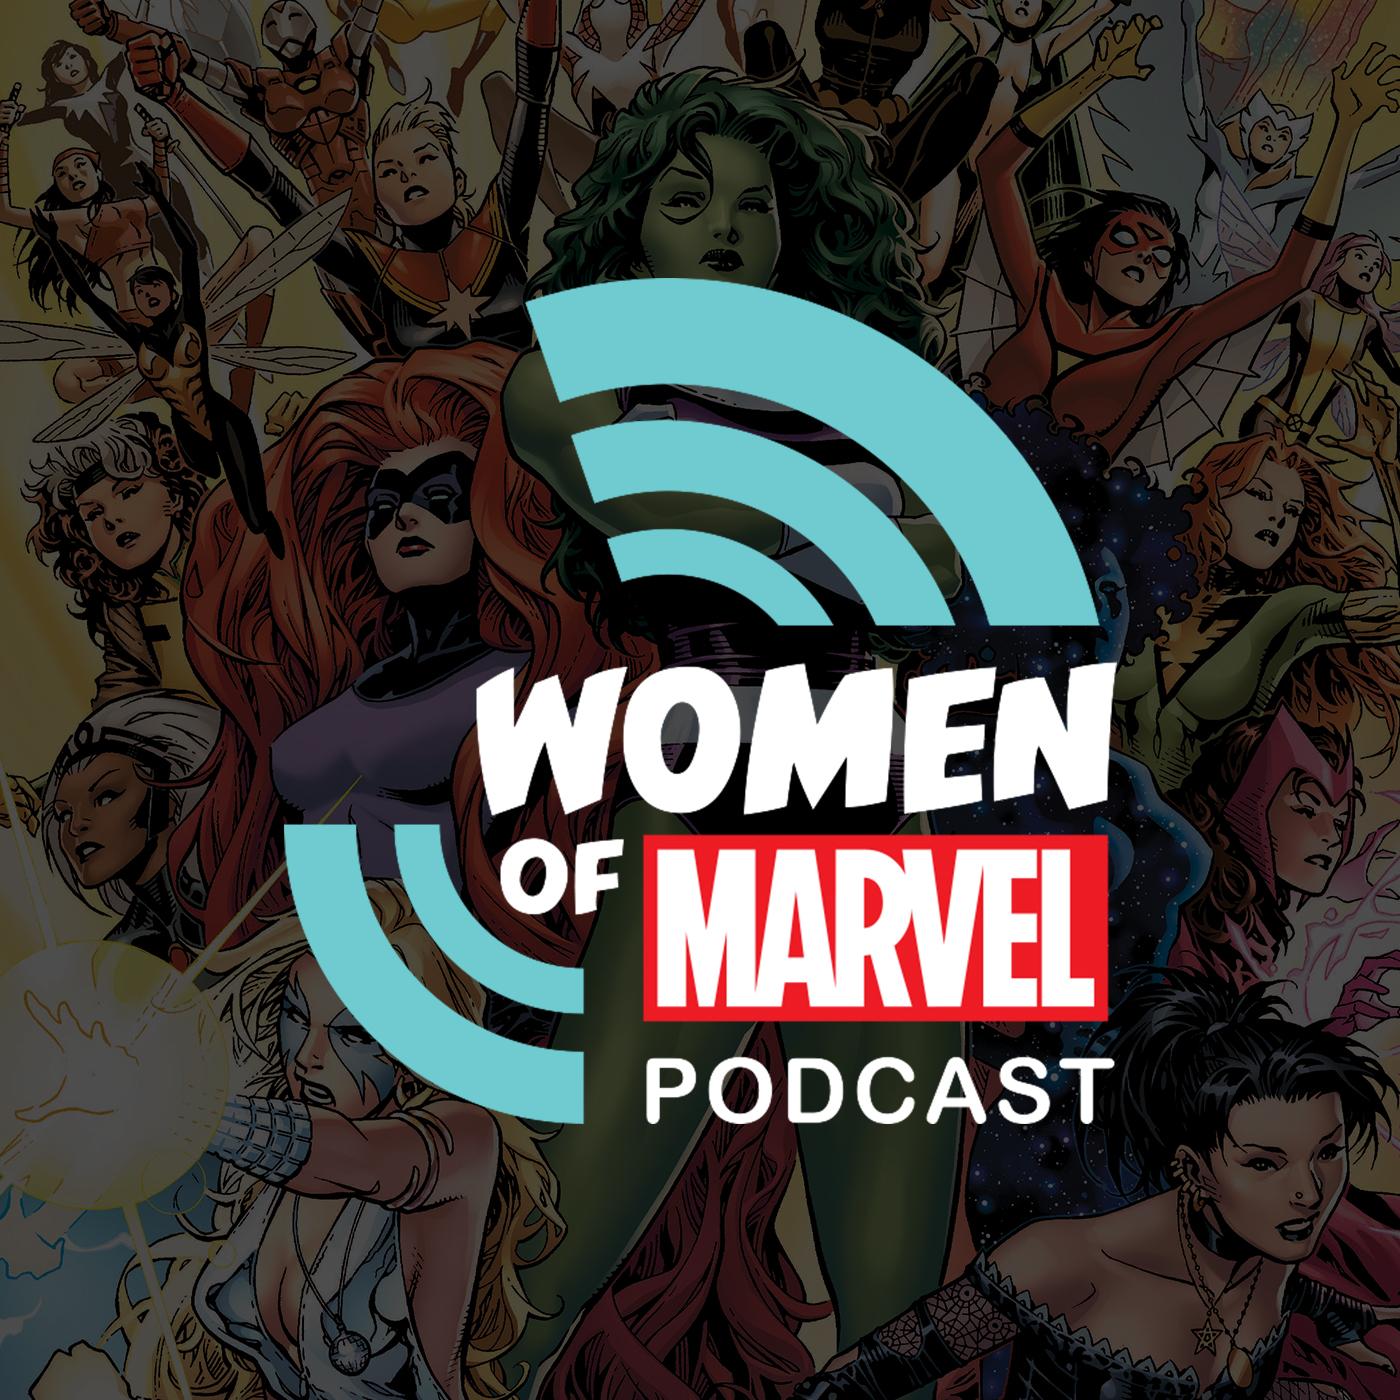 <![CDATA[Women of Marvel Podcast]]>